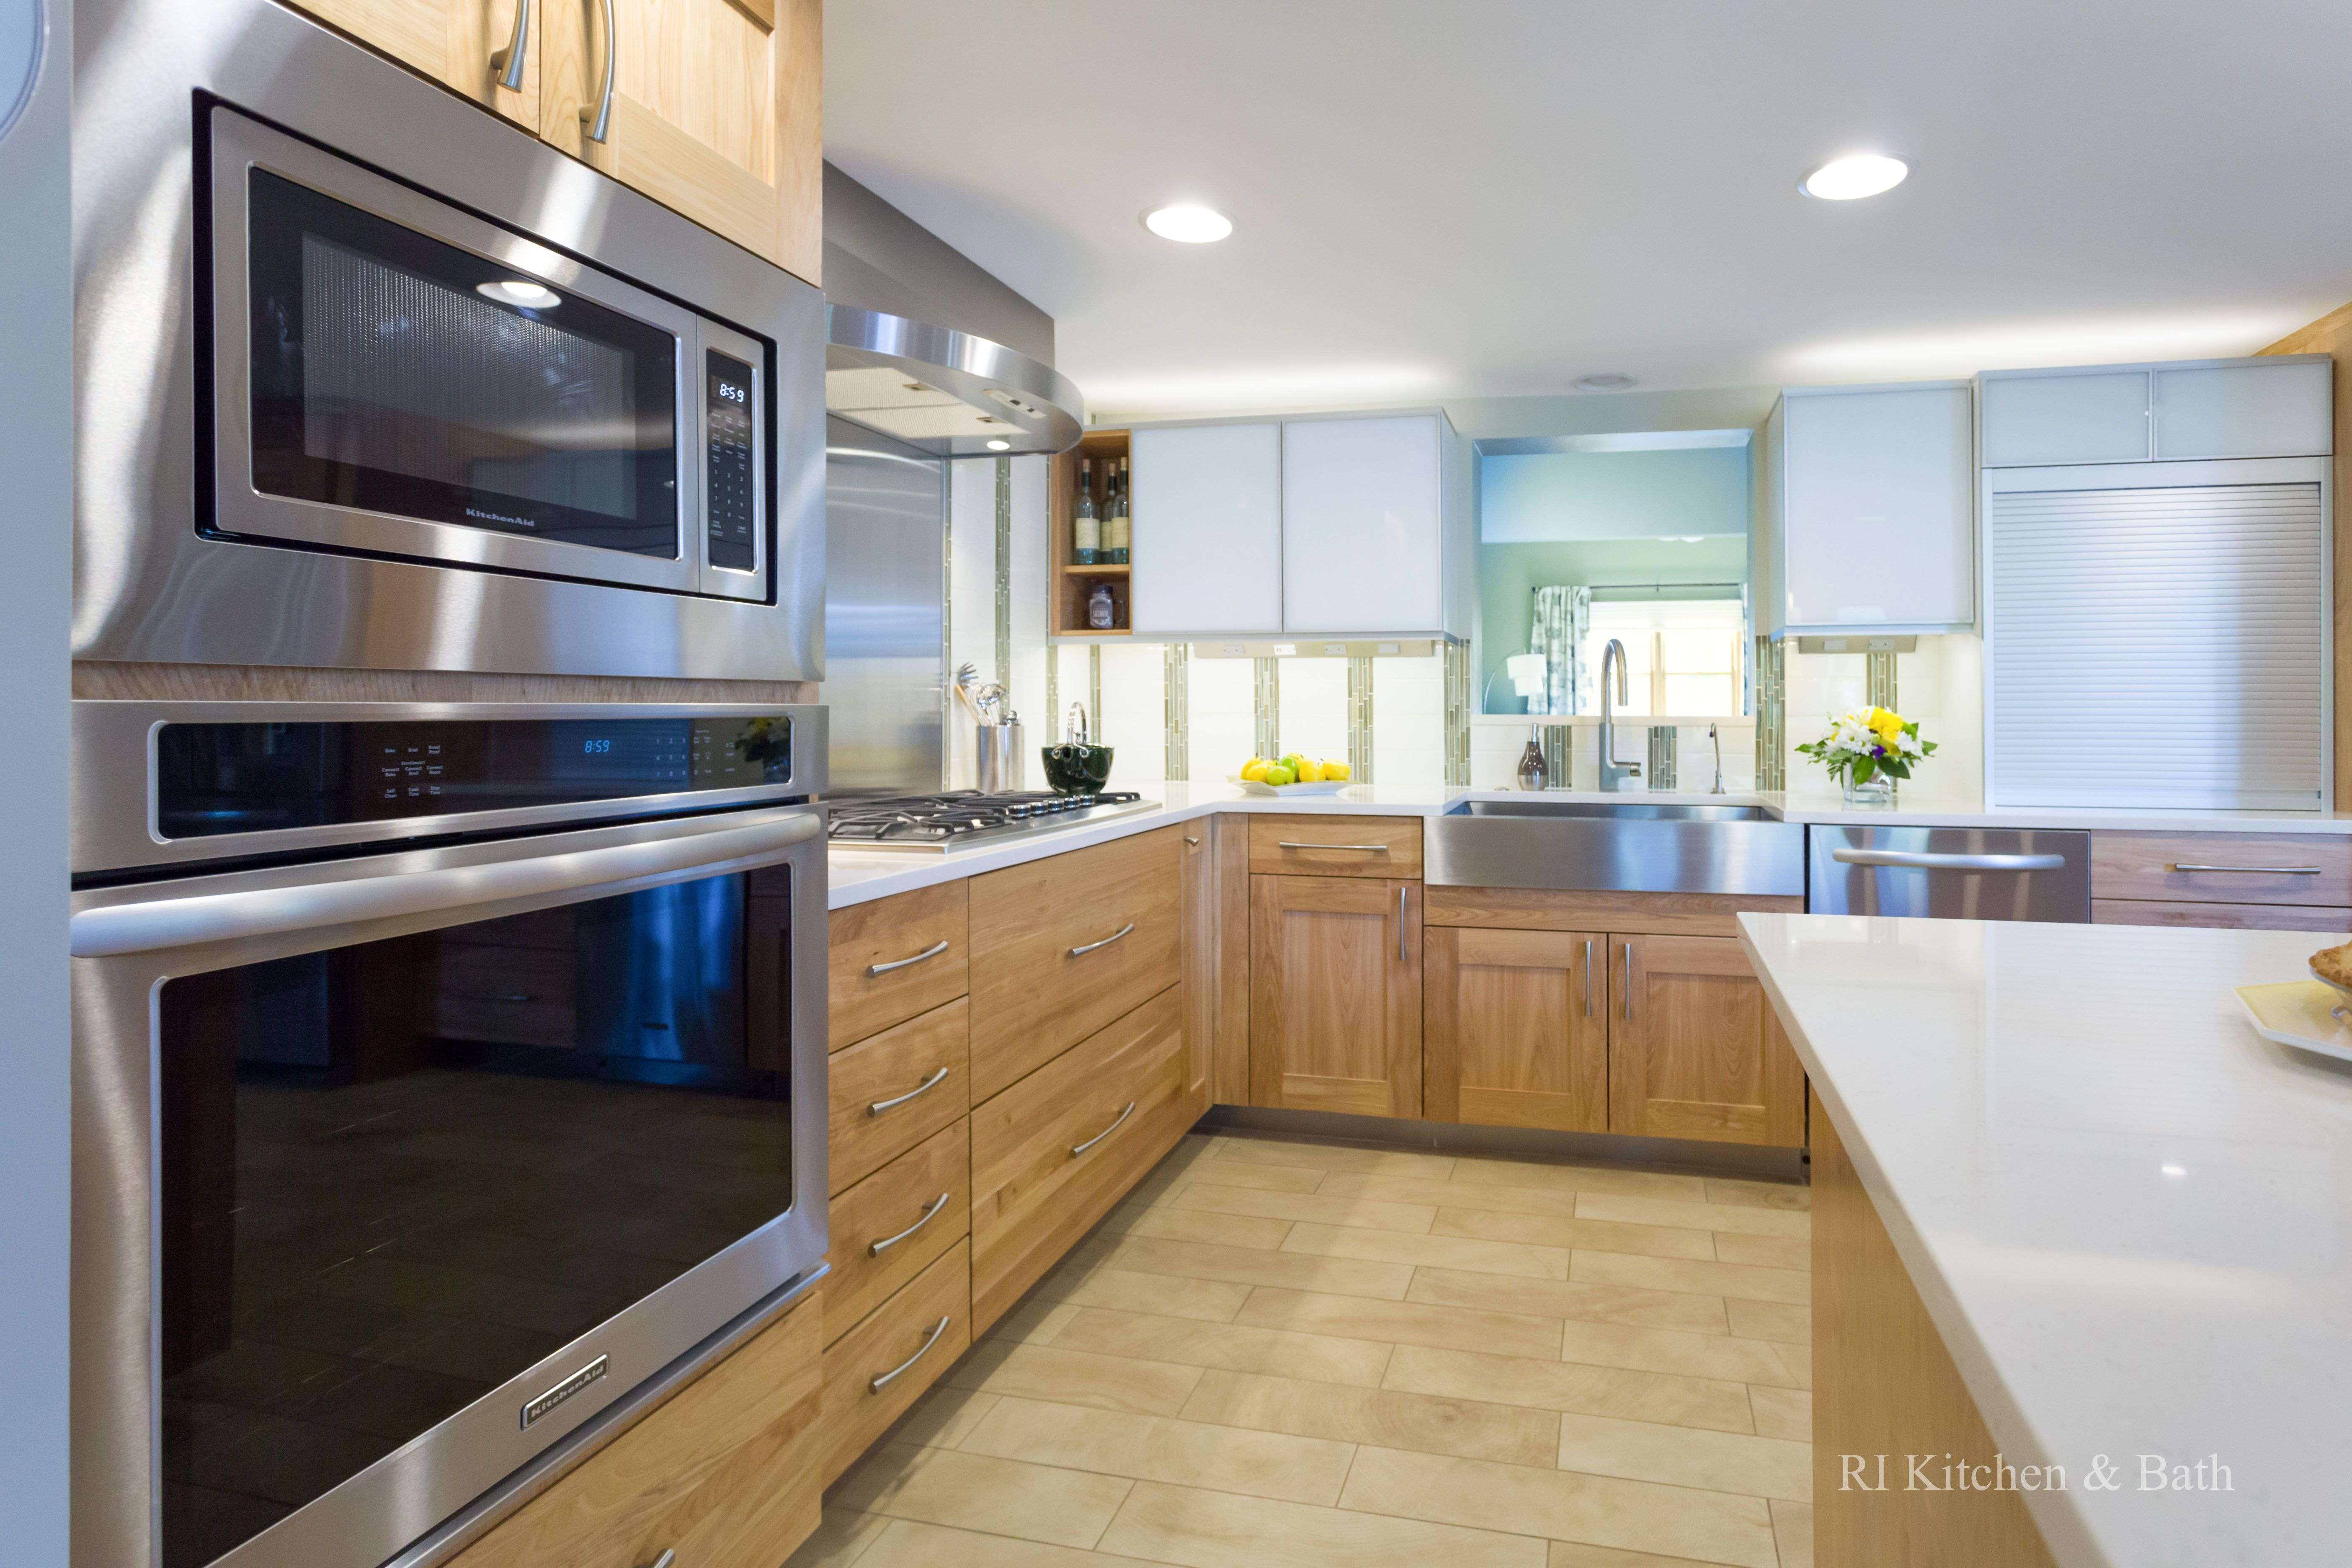 clean lined contemporary kitchen designed by ri kitchen bath rikb rh pinterest com ri kitchen and bath showroom ri kitchen and bath warwick